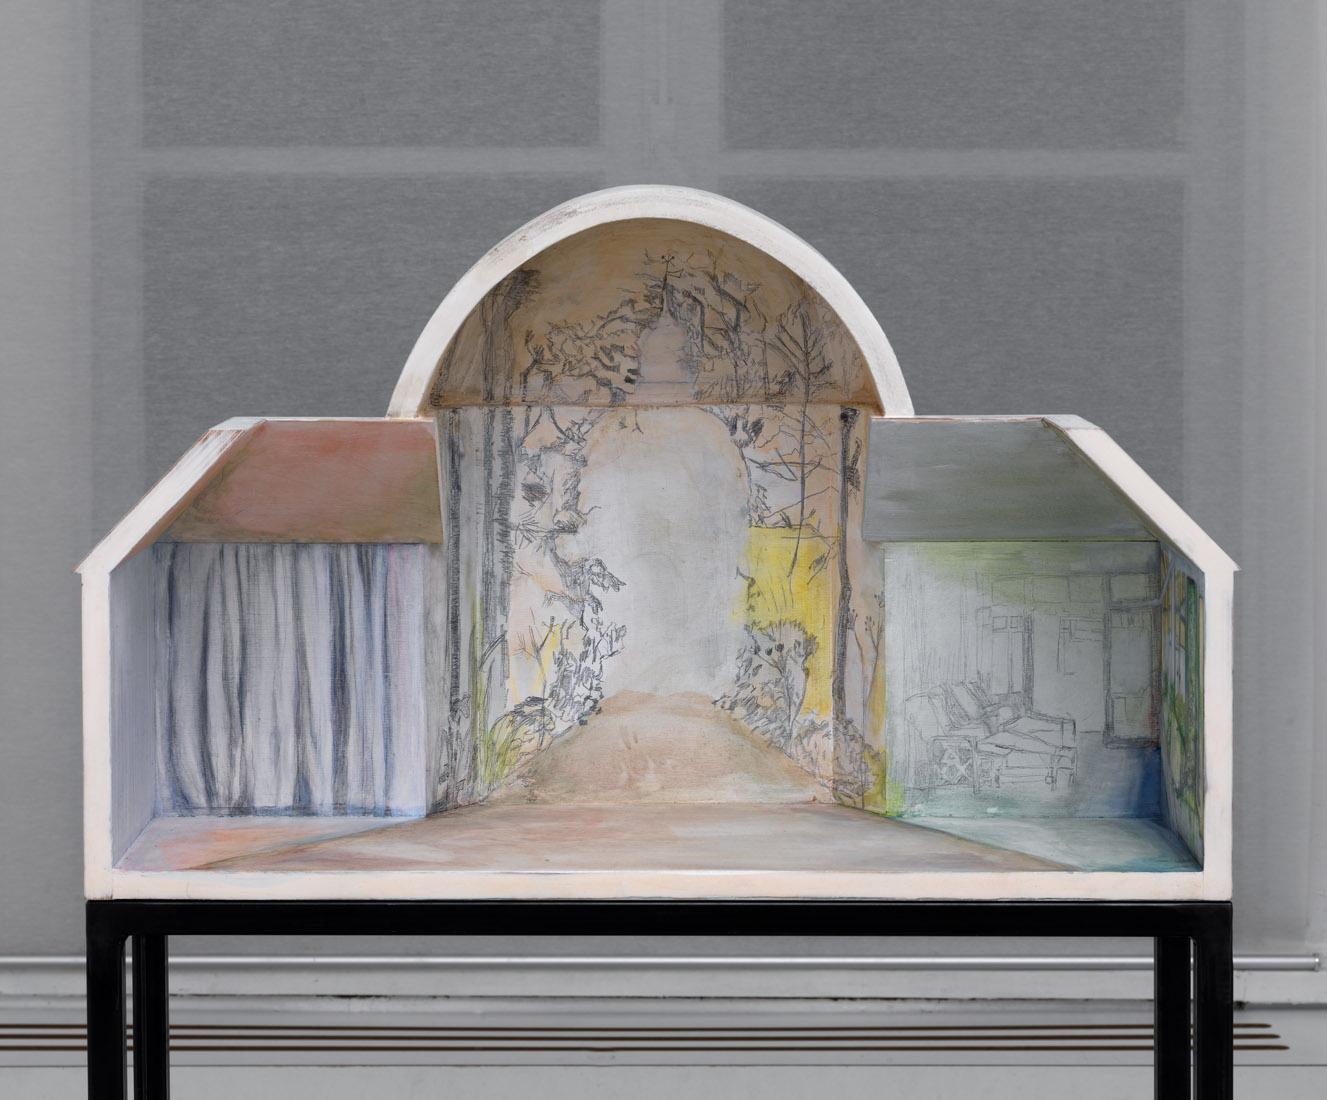 hili greenfeld, untitled sculpture, 2019